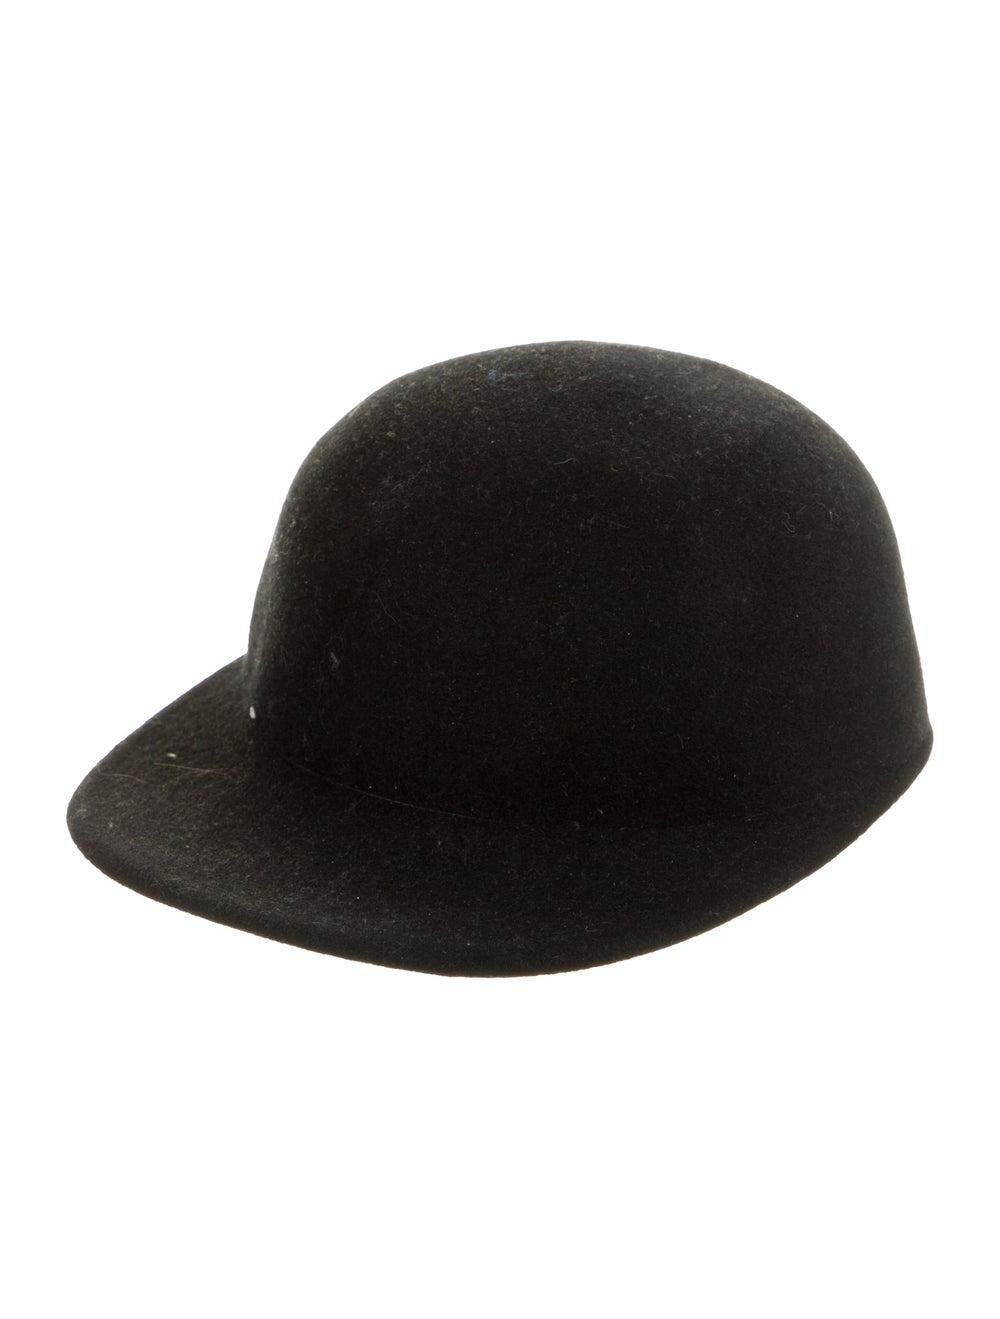 Janessa Leone Wool Jockey Hat Black - image 1